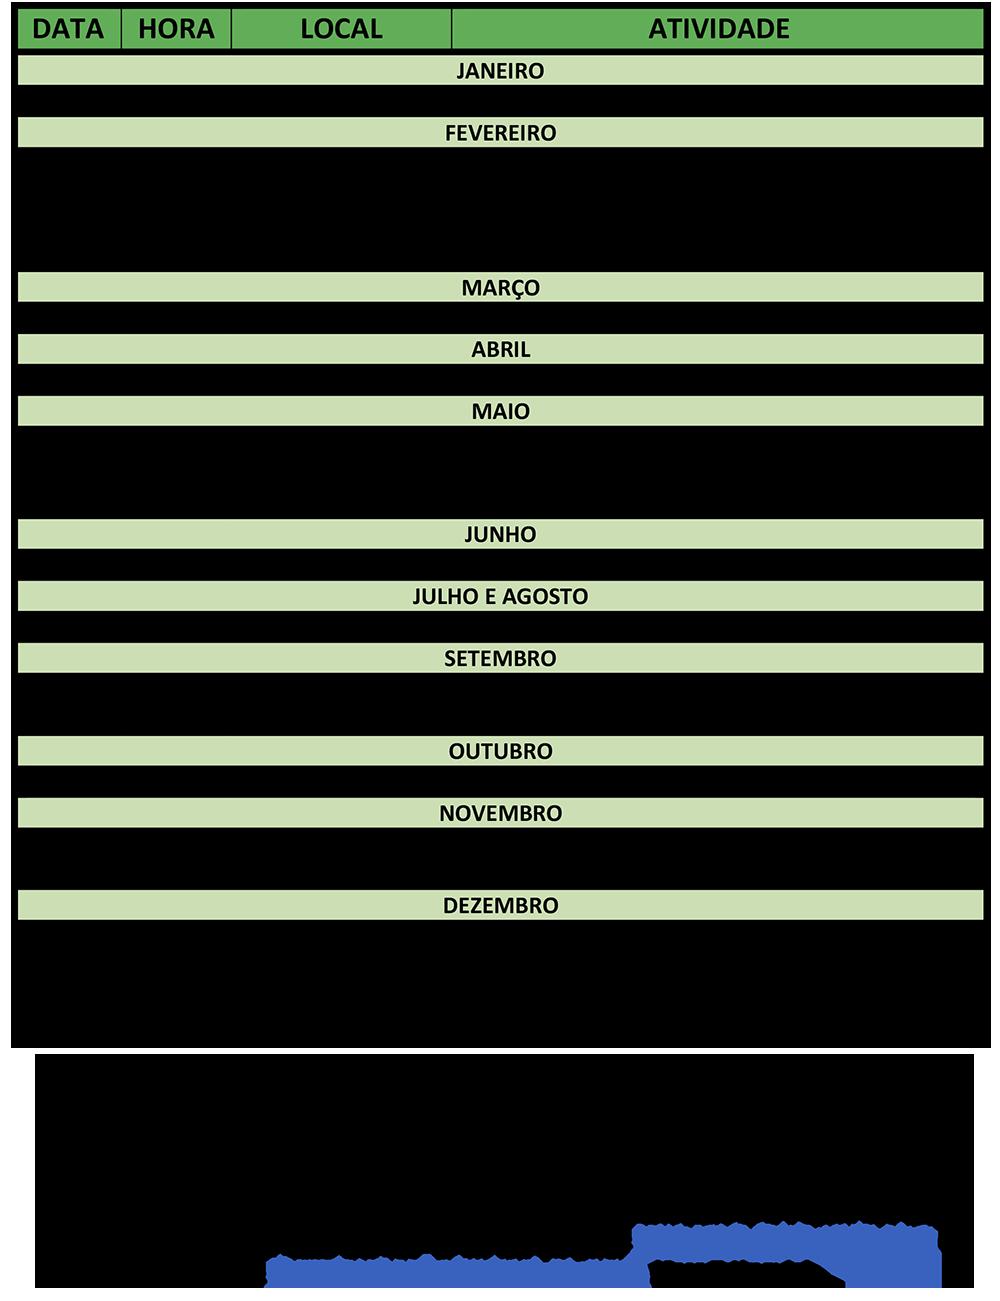 Cronograma - Plano de Atividades 2017 CT